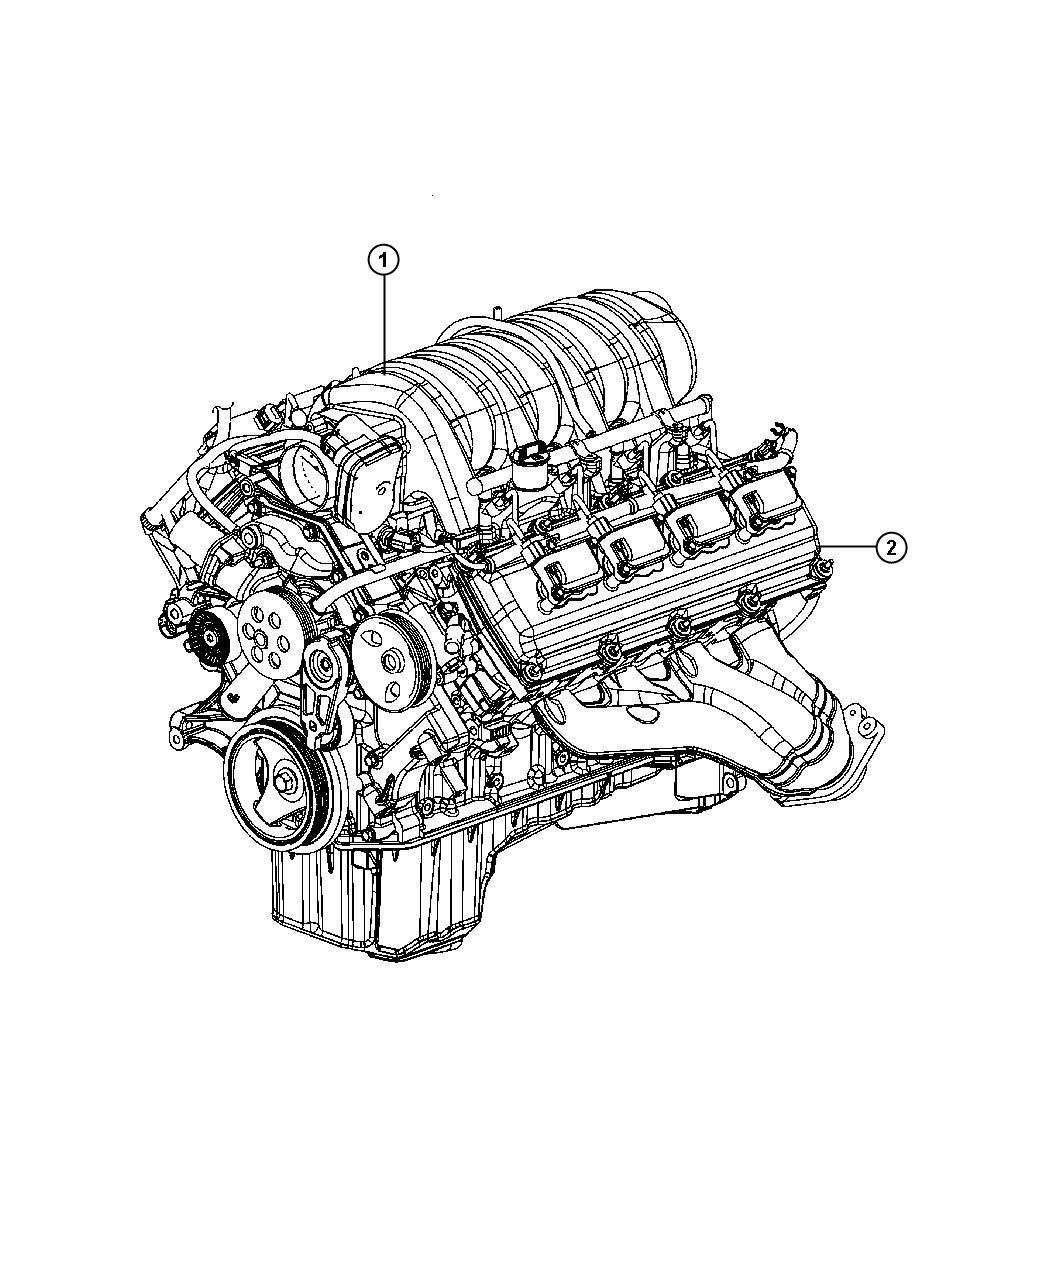 2010 Dodge Challenger Engine. Complete. Assembly, block